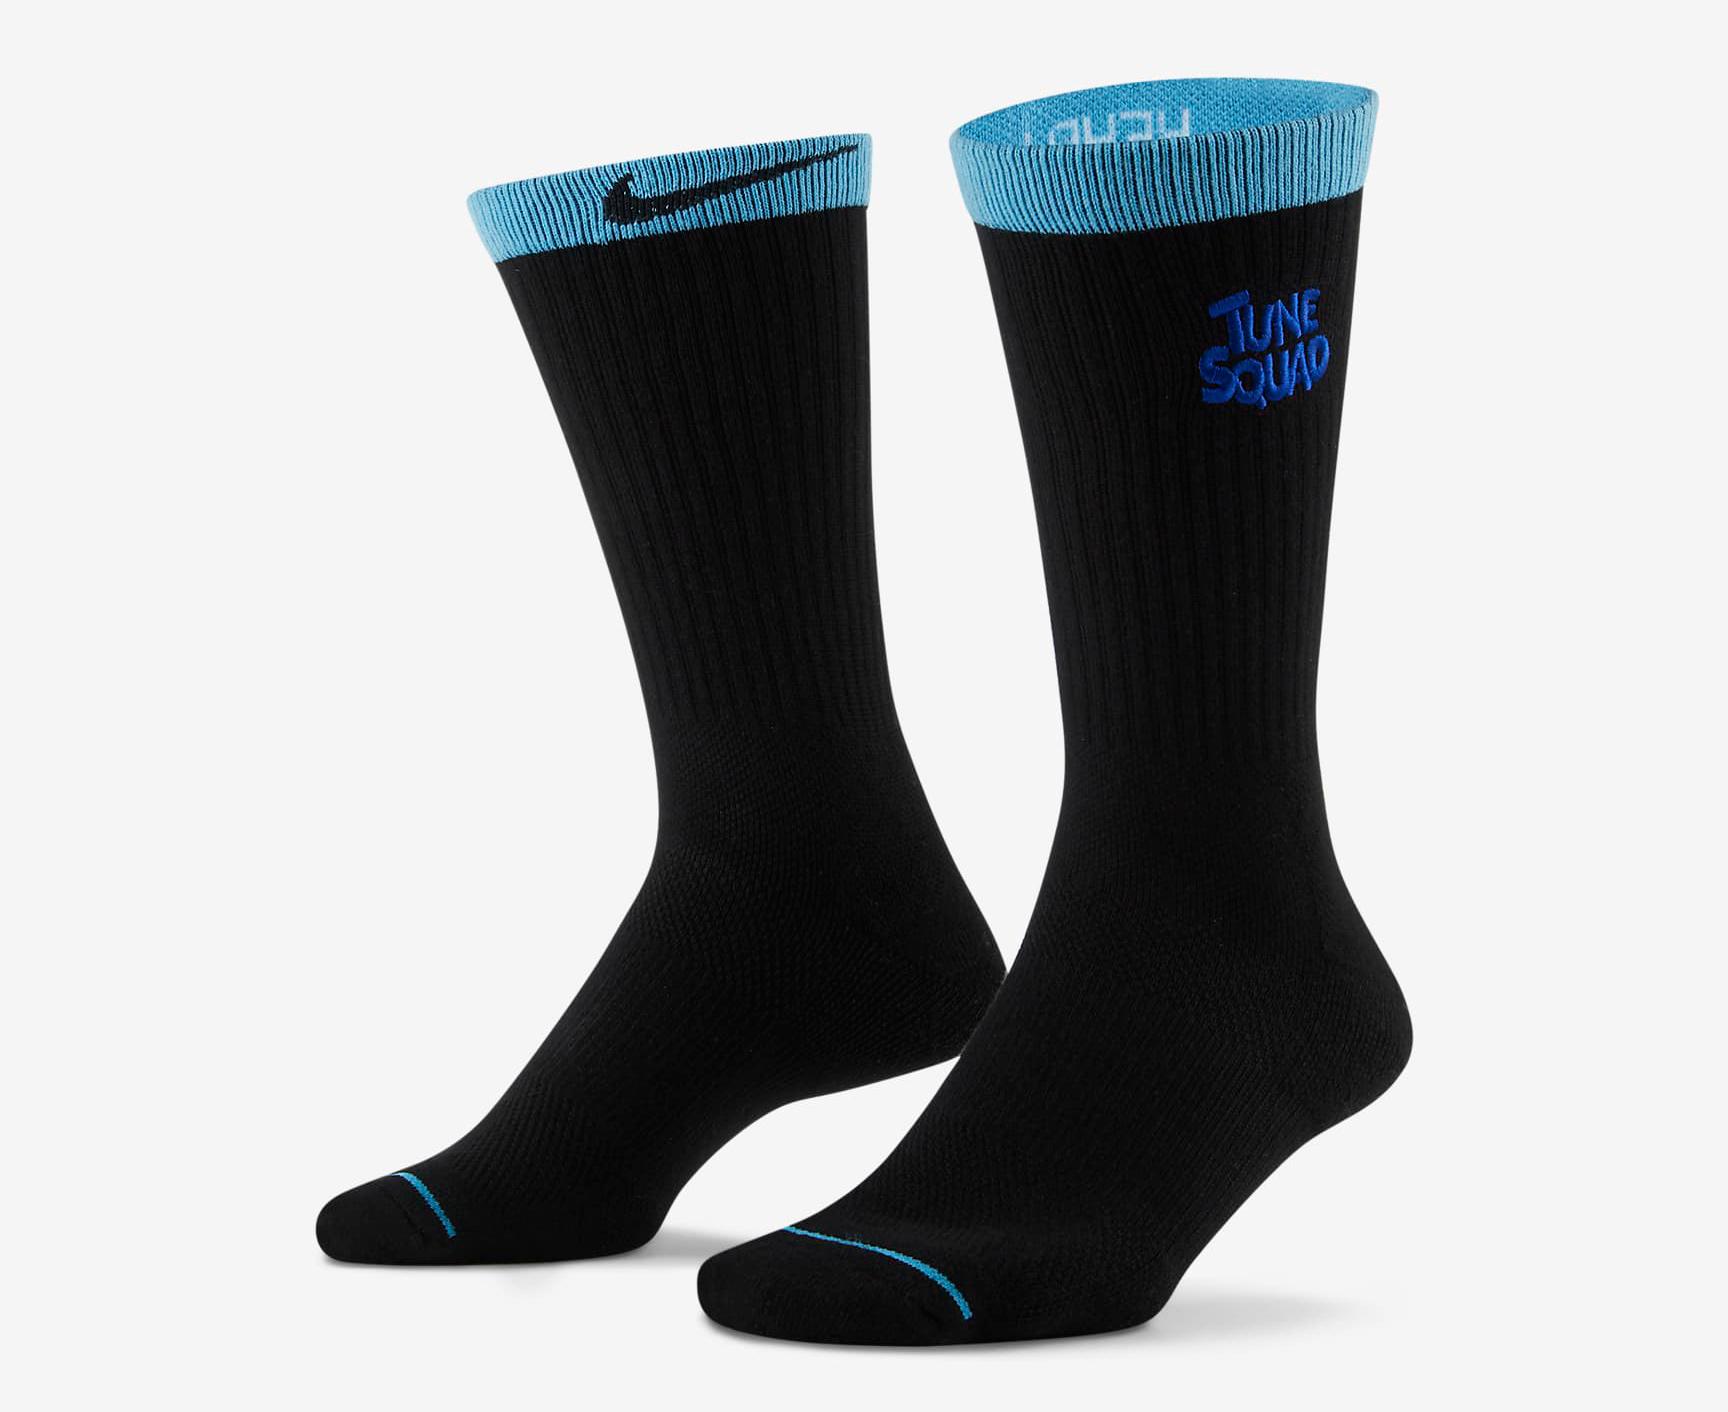 nike-space-jam-a-new-legacy-tune-squad-socks